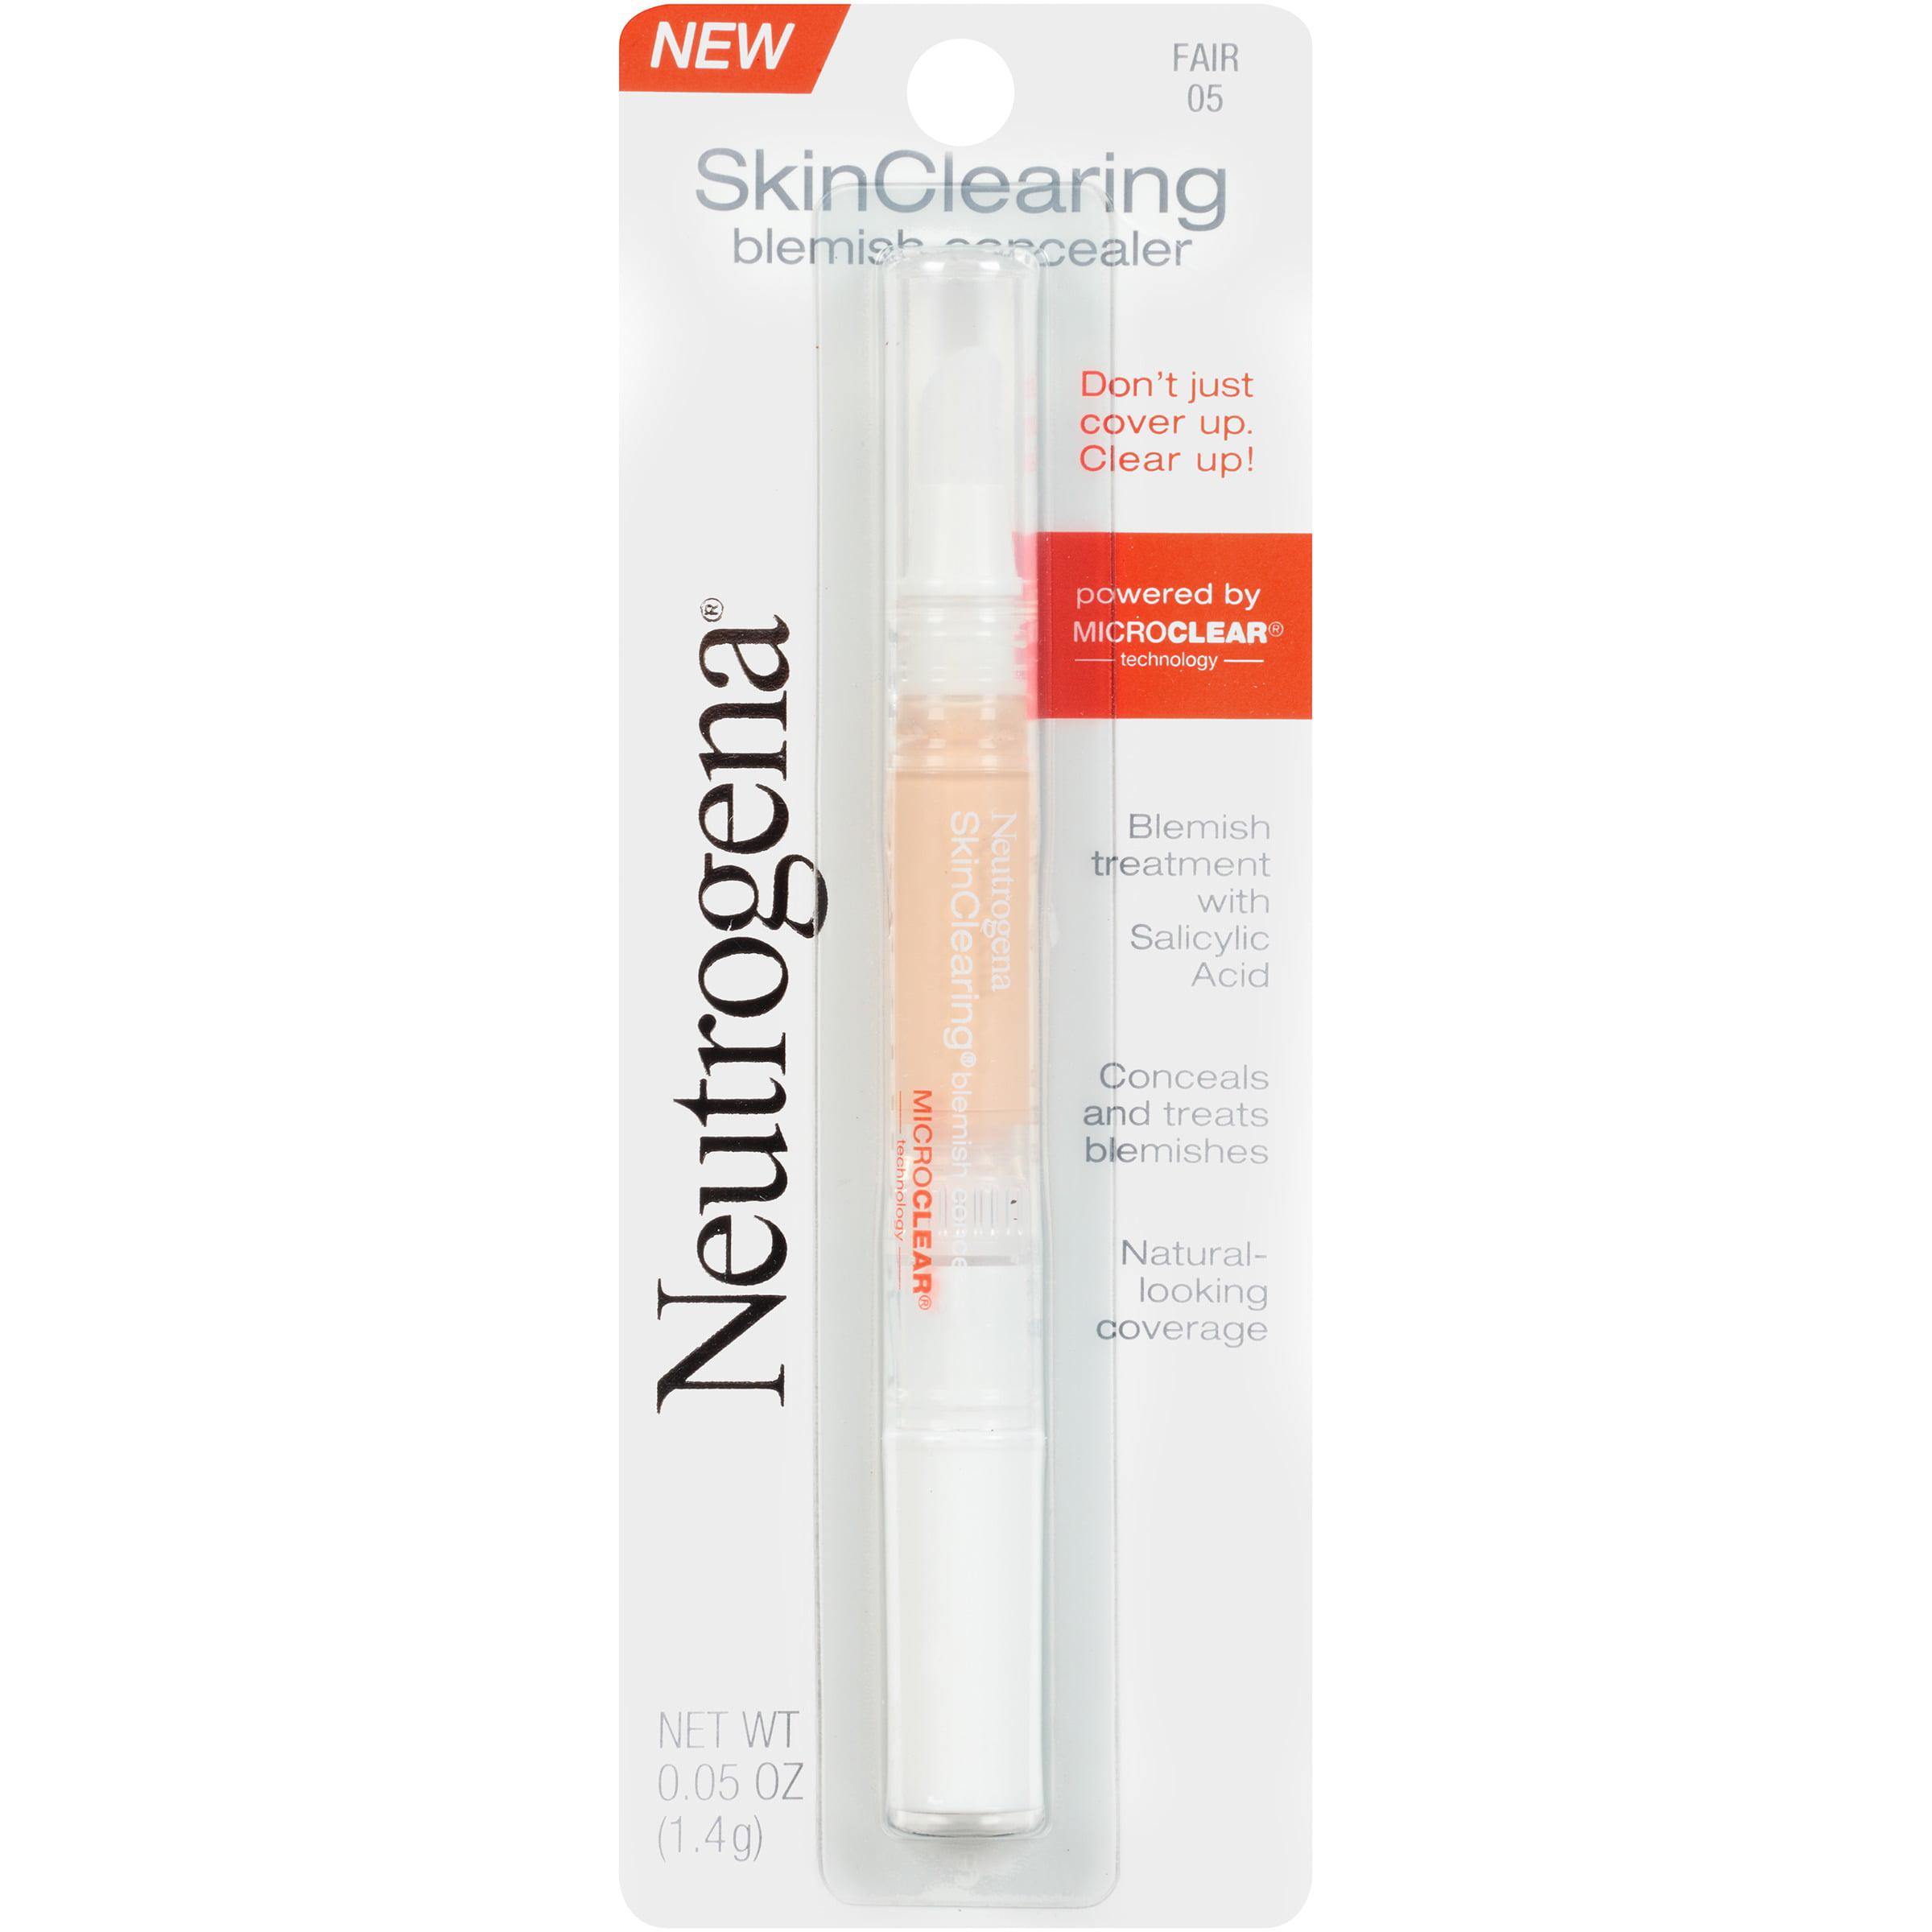 Neutrogena Skinclearing Blemish Concealer, Fair 05, .05 Oz. - Walmart.com